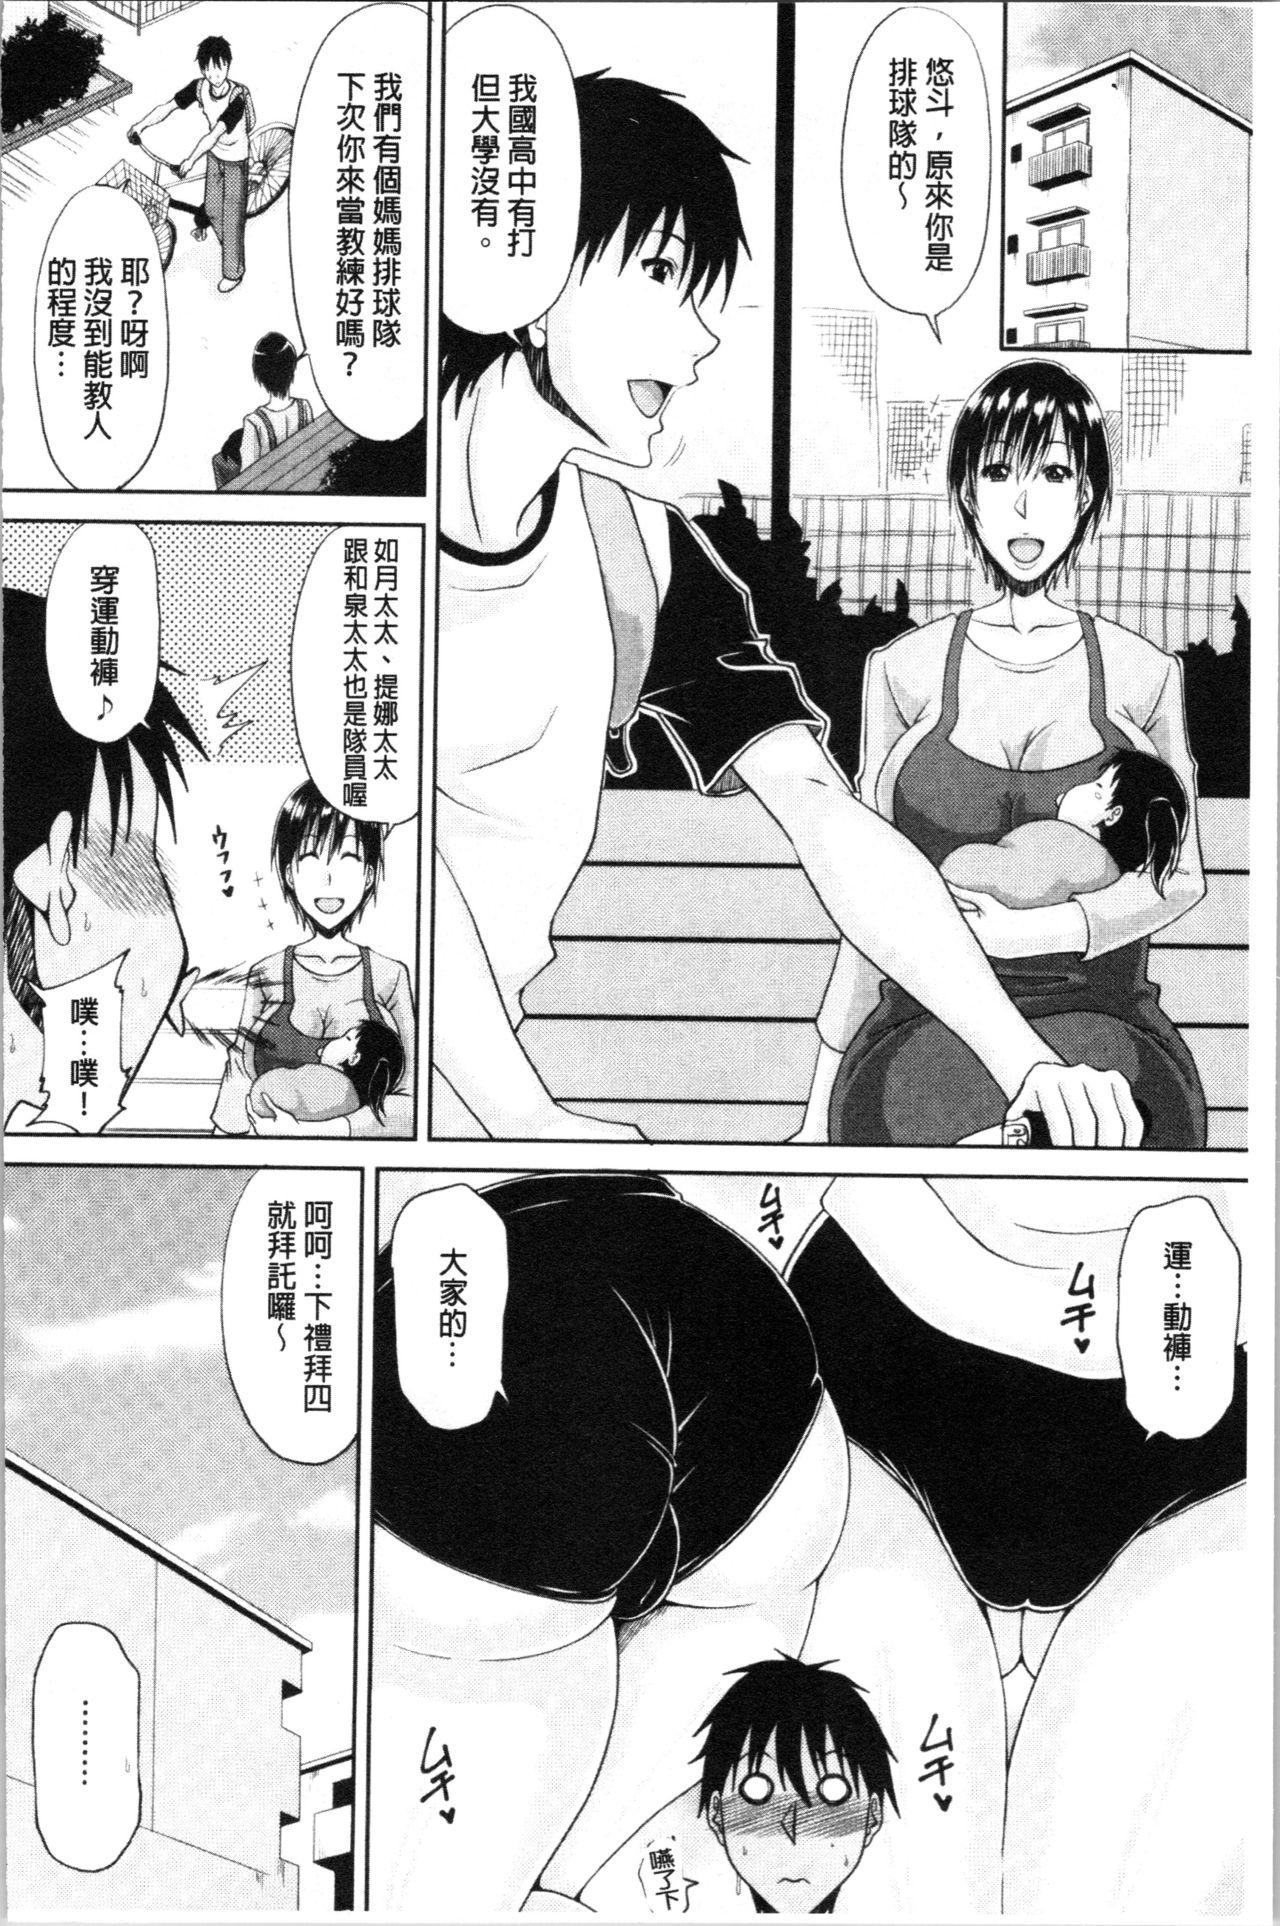 Haramase! 96